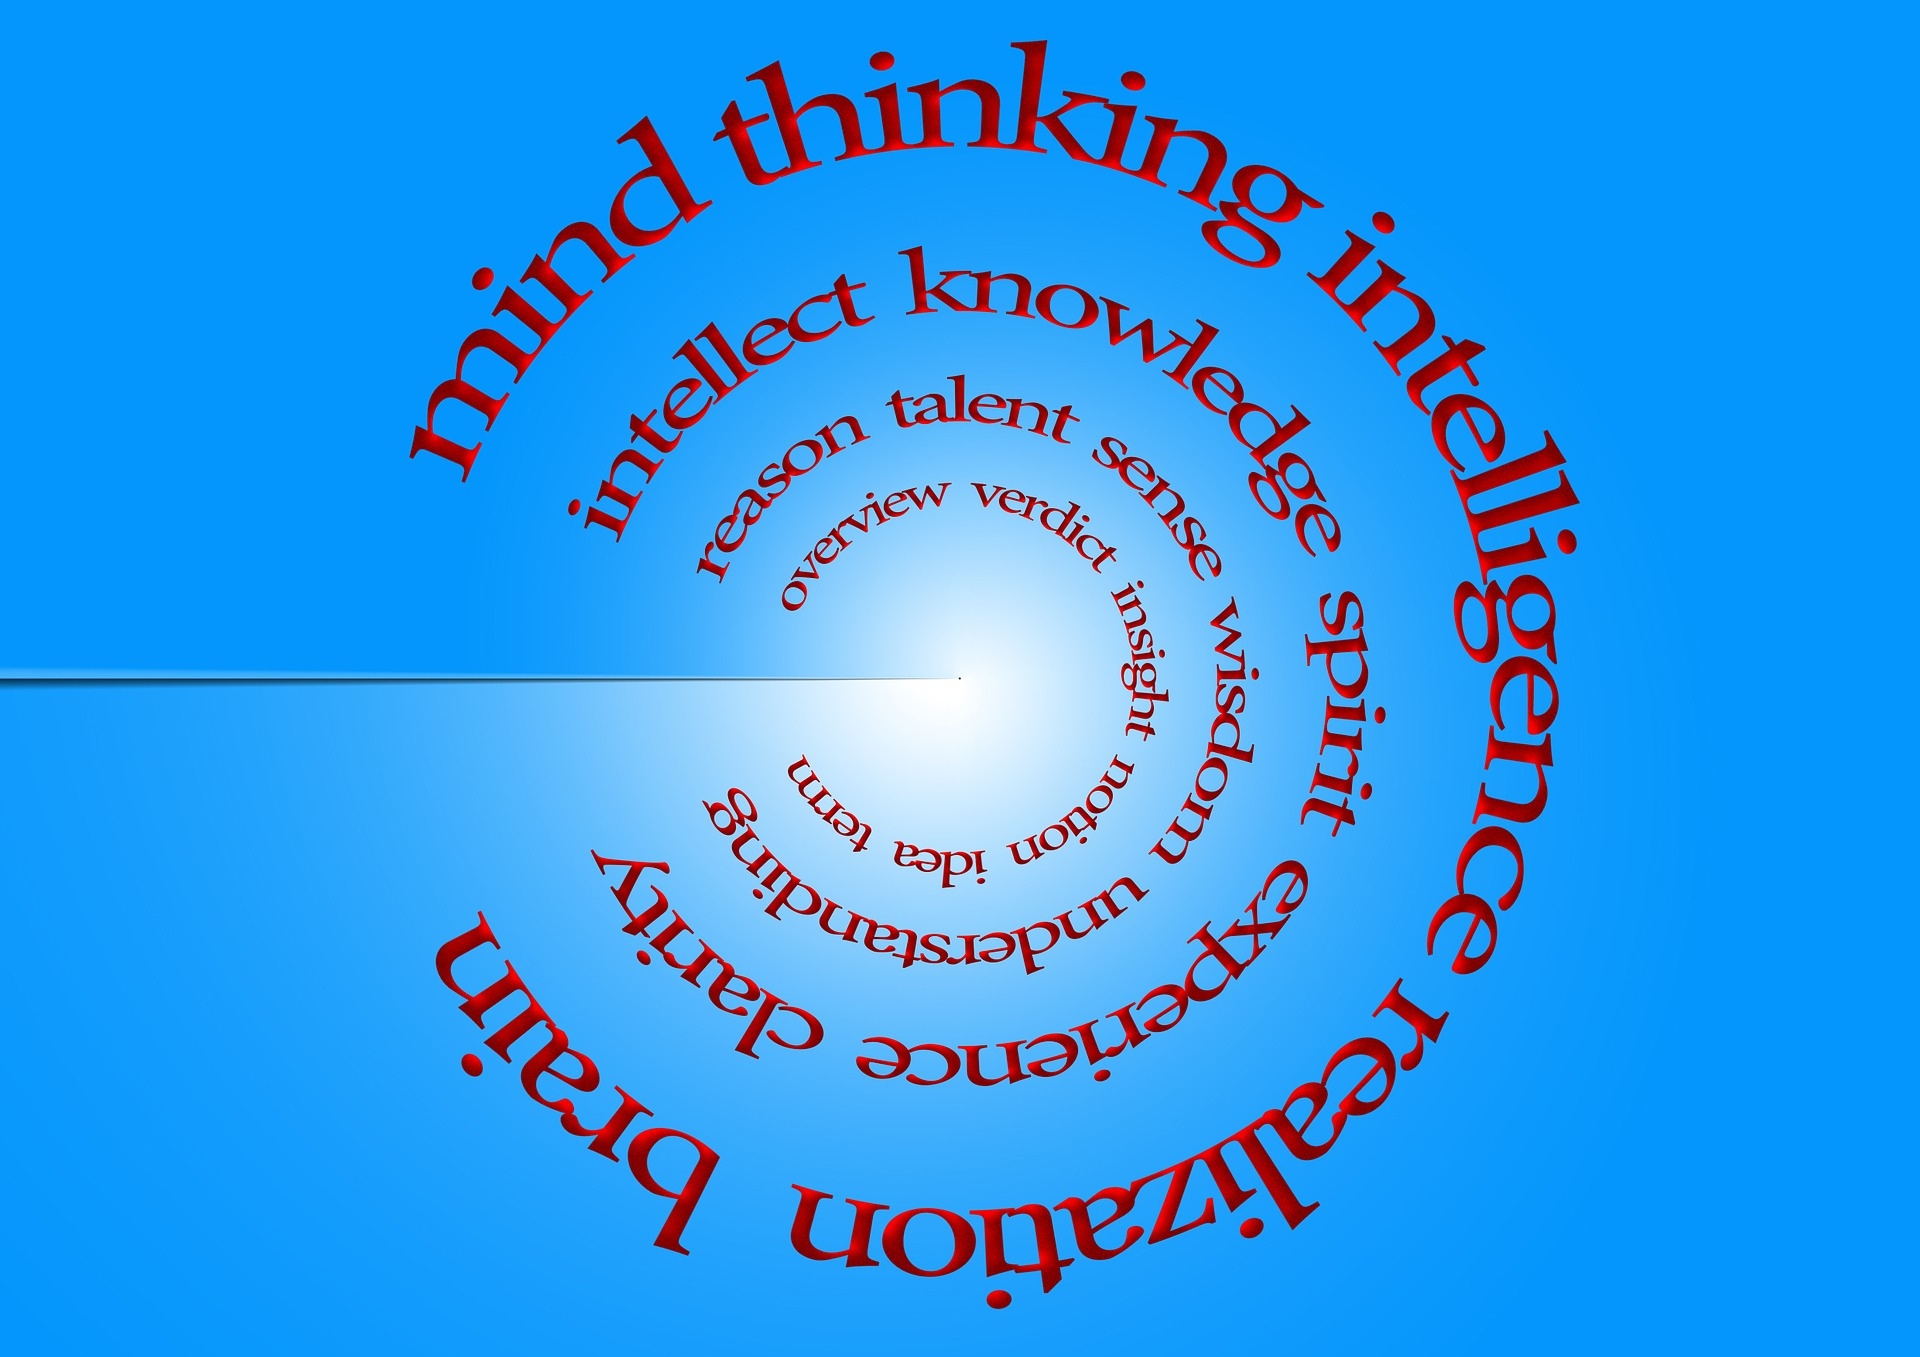 https://pixabay.com/en/mind-think-spirit-soap-bubble-767592/